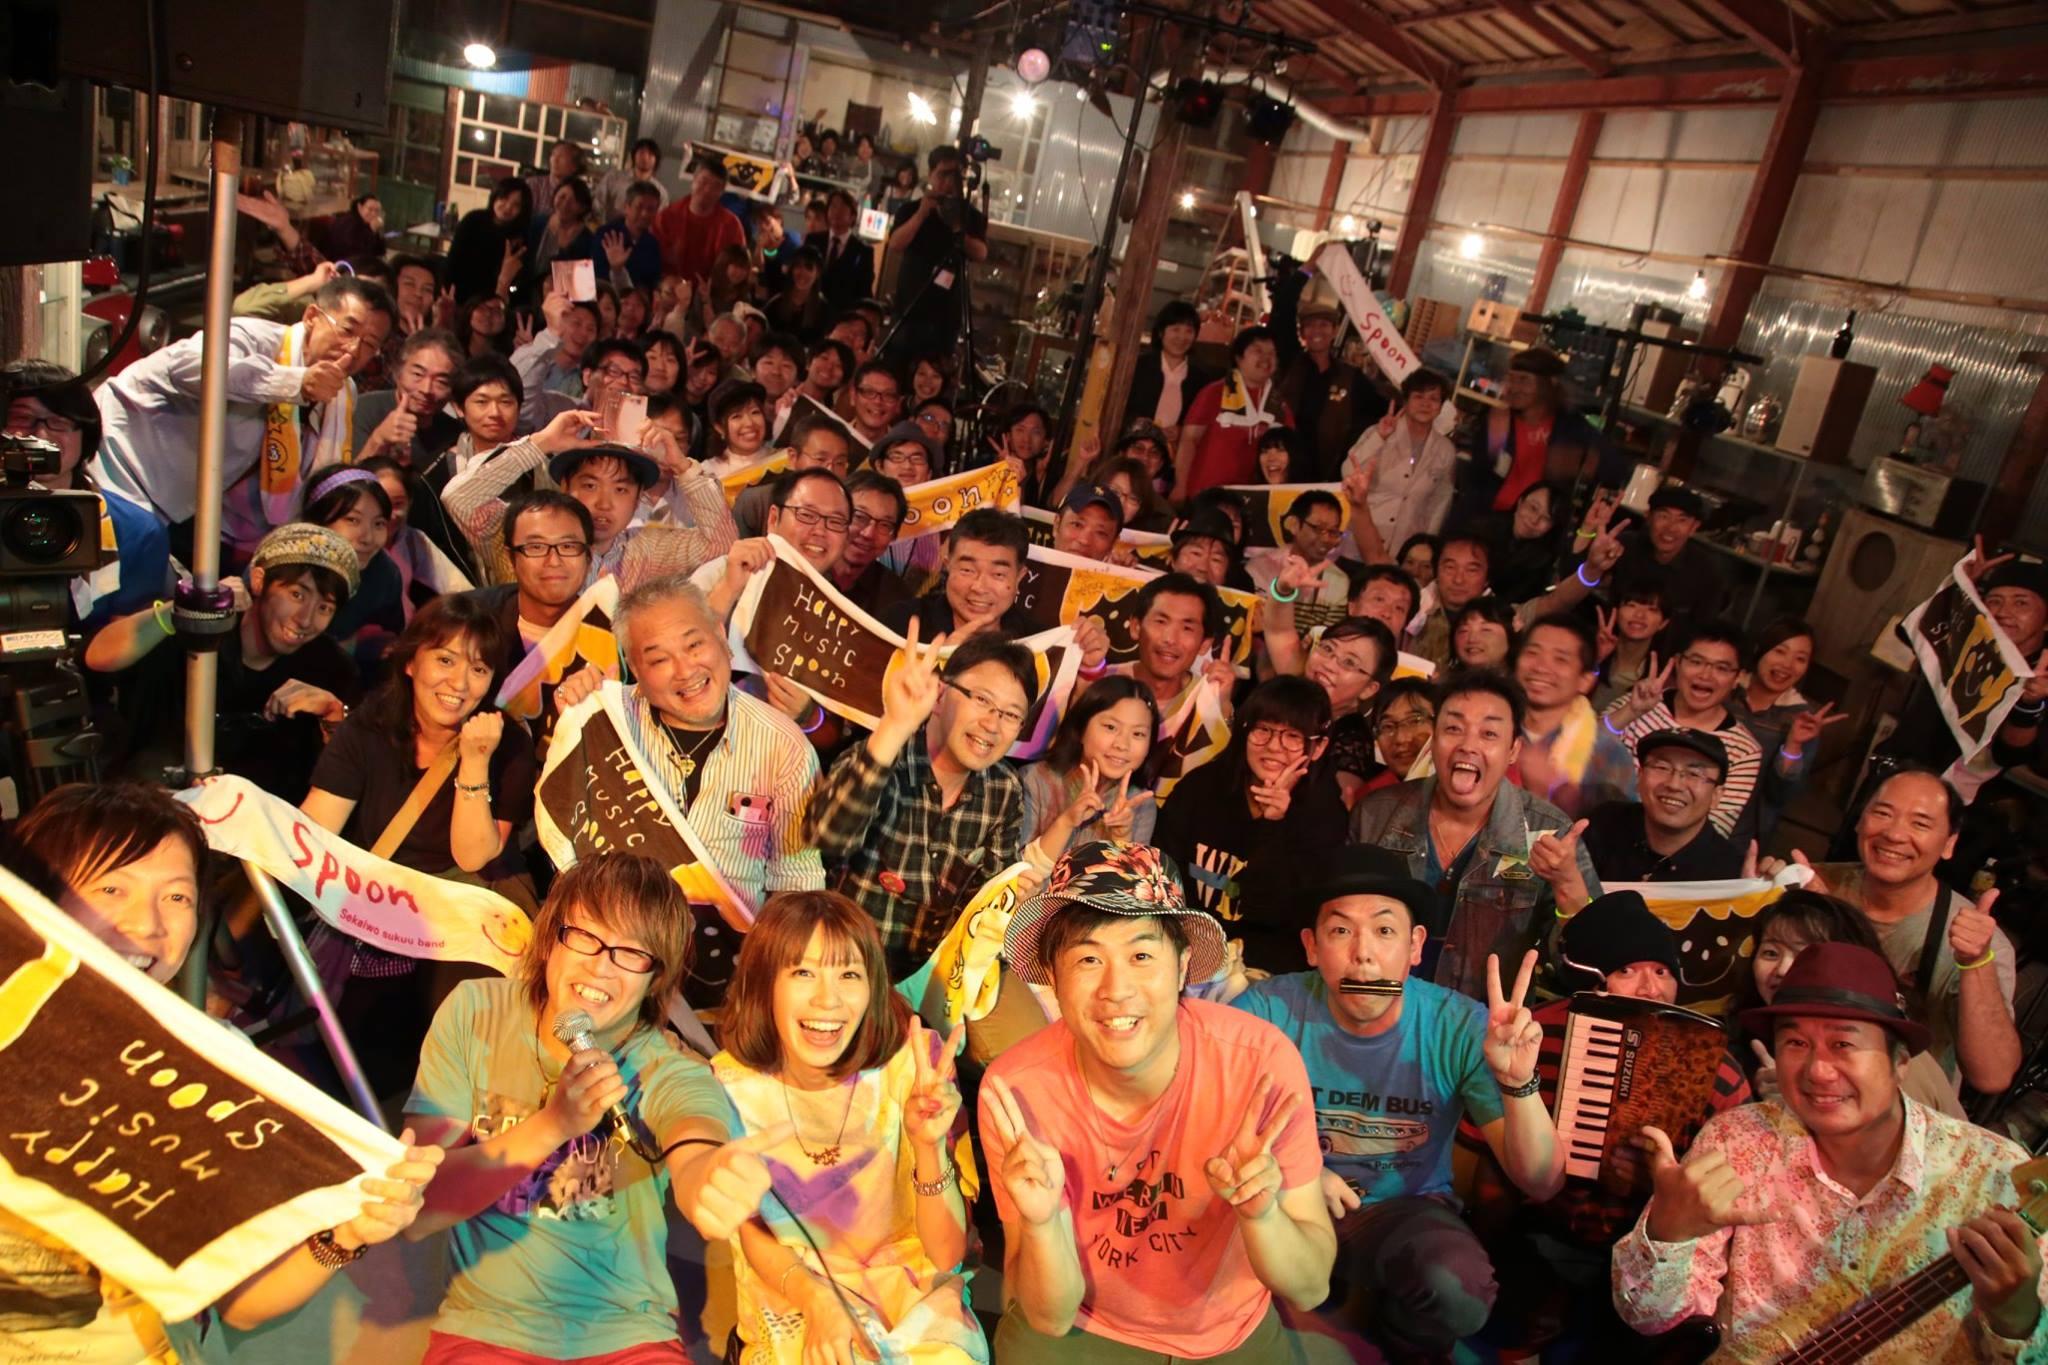 Spoon Lan Lan Lalalive2016~ワンダーランドな夜~in掛川アンティークカフェROAD